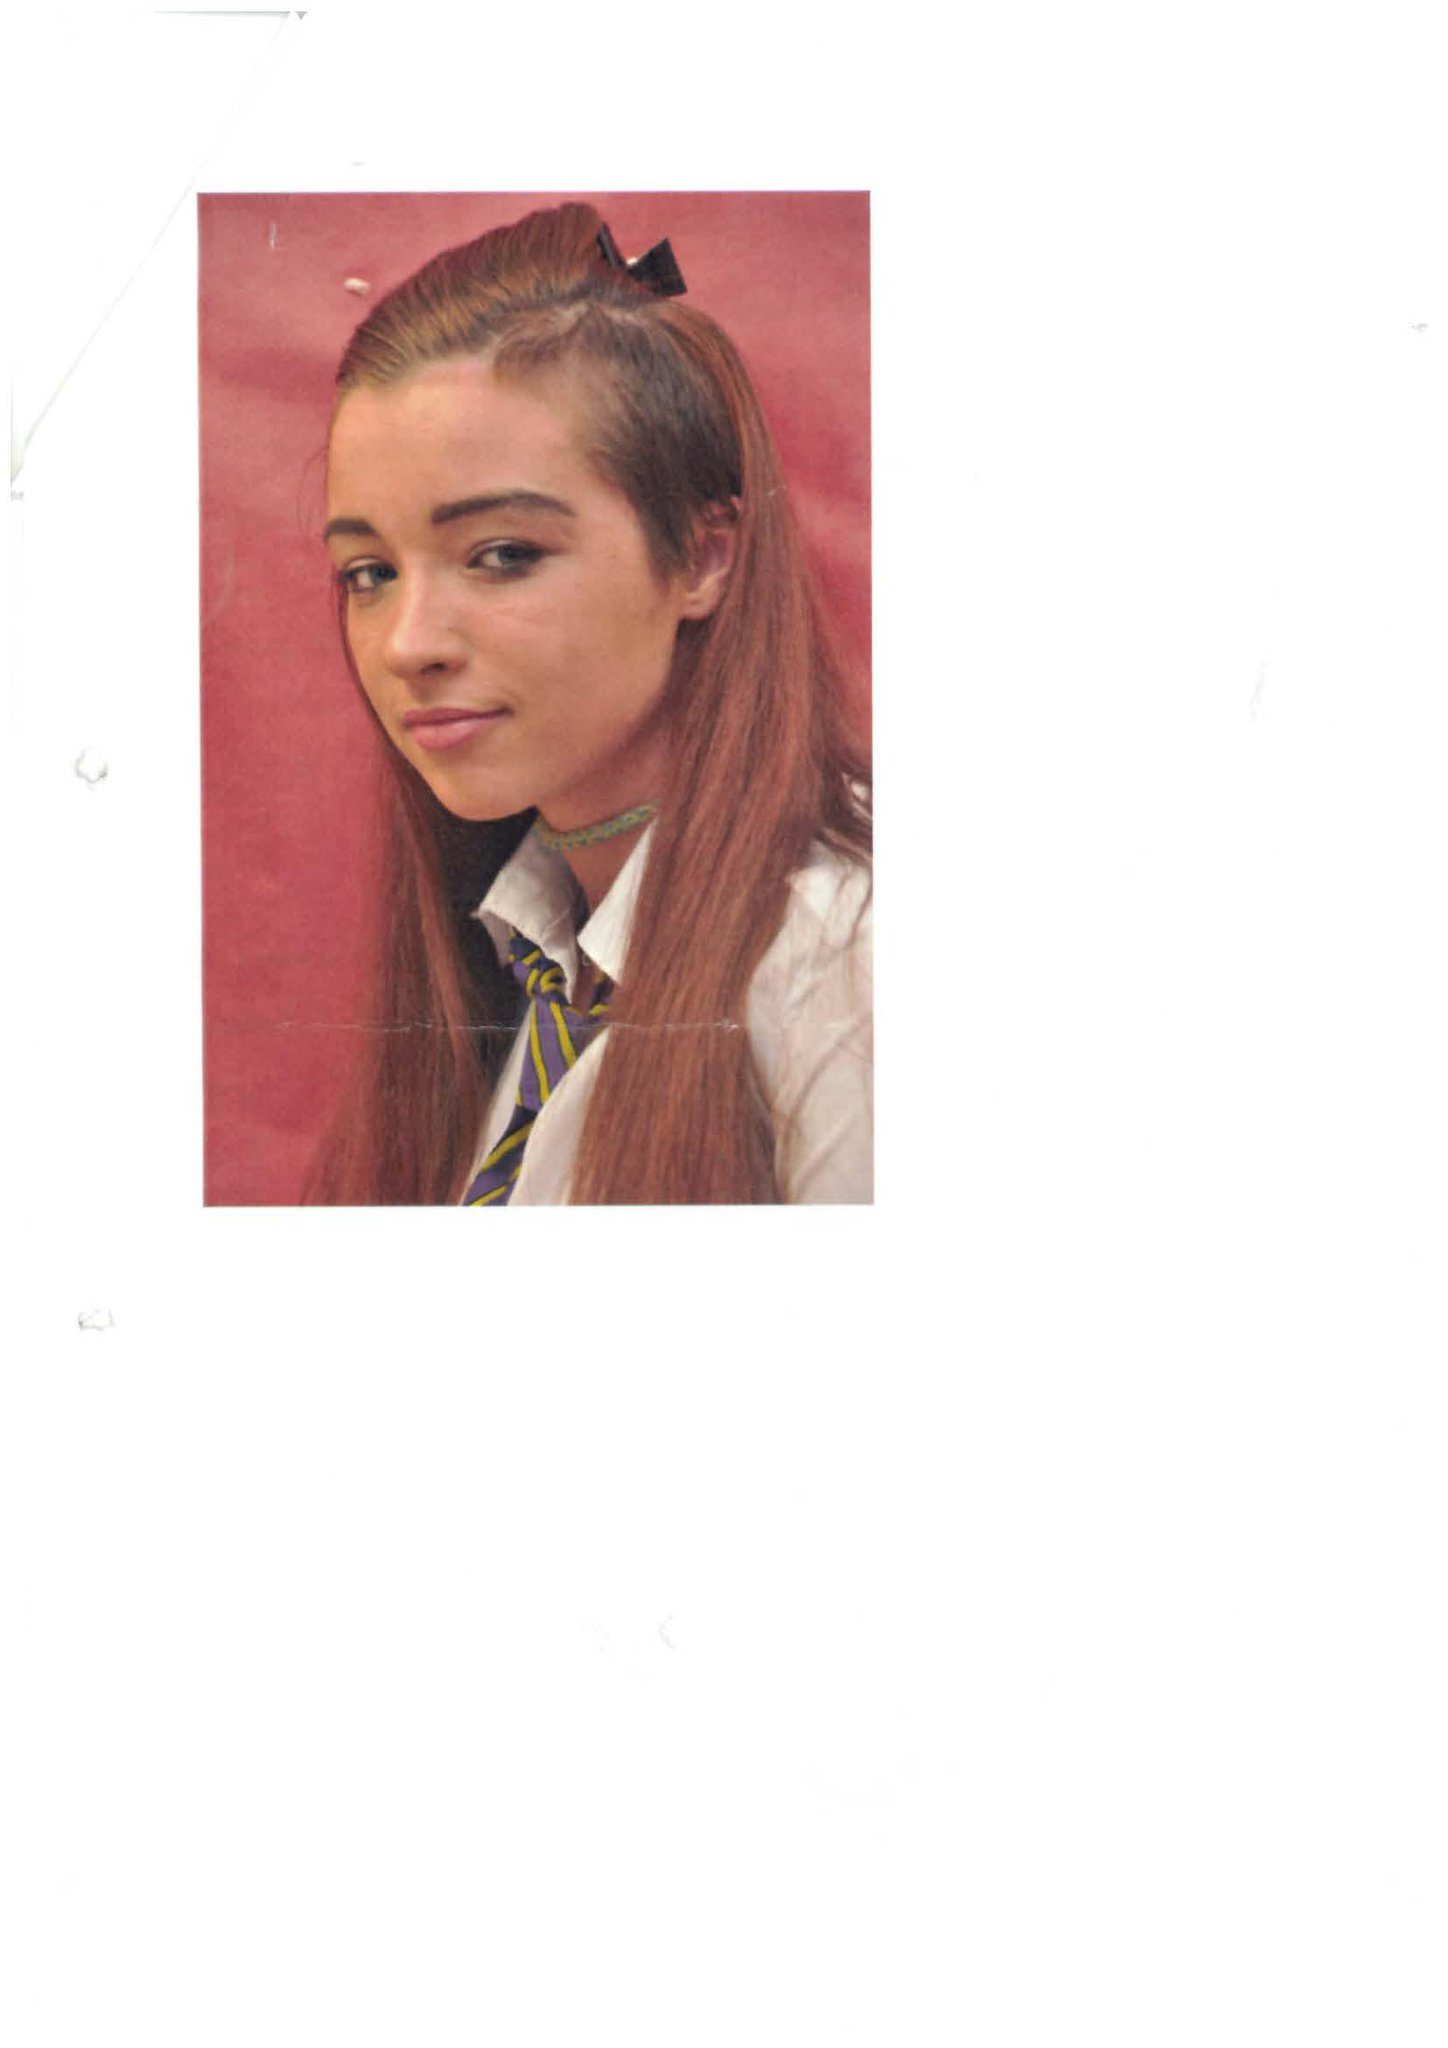 RT @jamesmatthewsky: Police want help tracing Courtney Leonard,15, from Stirling. Last seen around Pollokshaws Rd,Glasgow Tues aftnoon http…